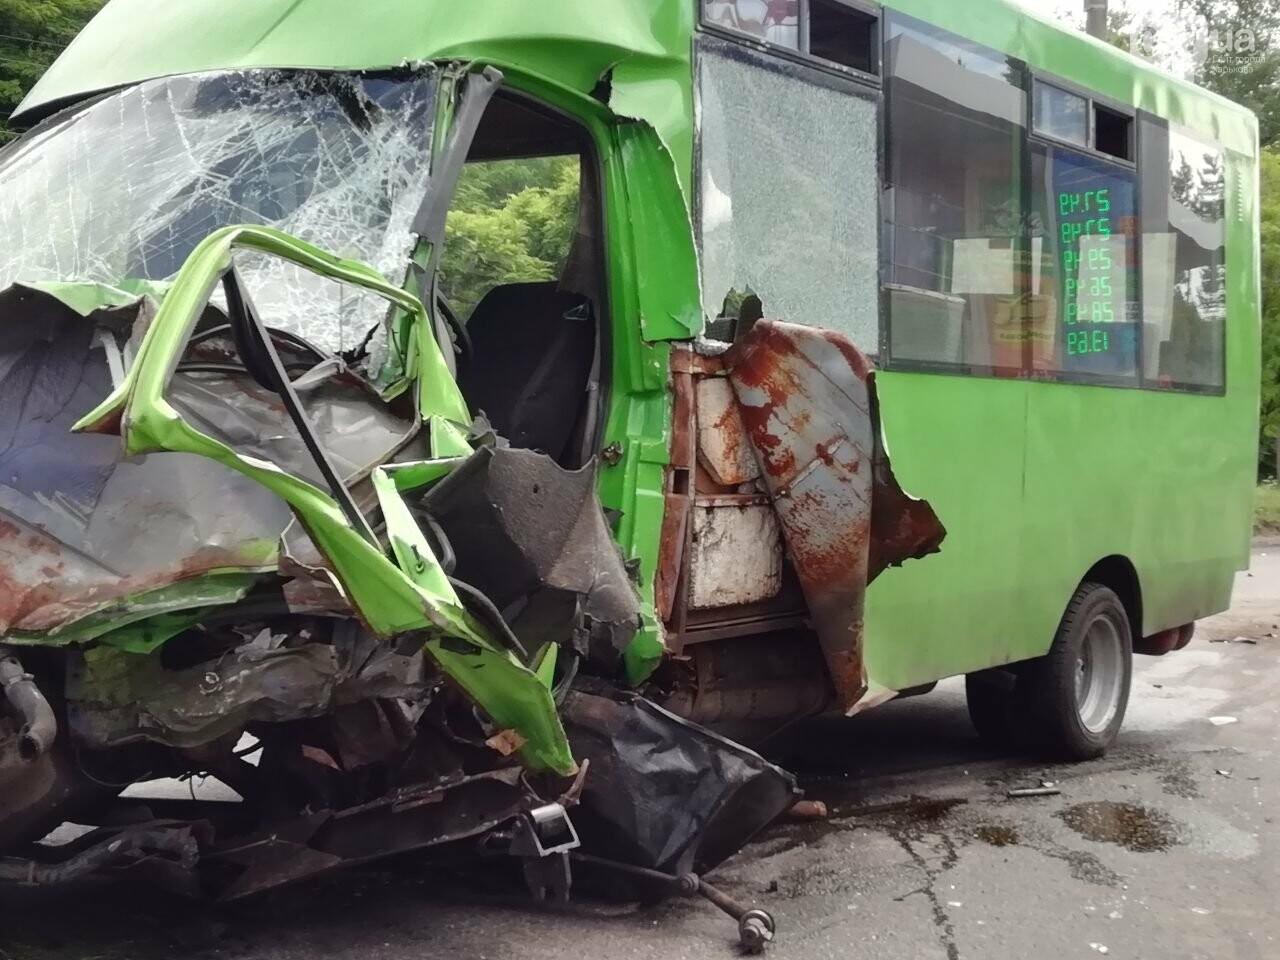 «Все сидели в крови»: подробности аварии на проспекте Тракторостроителей, - ФОТО, ВИДЕО, фото-4